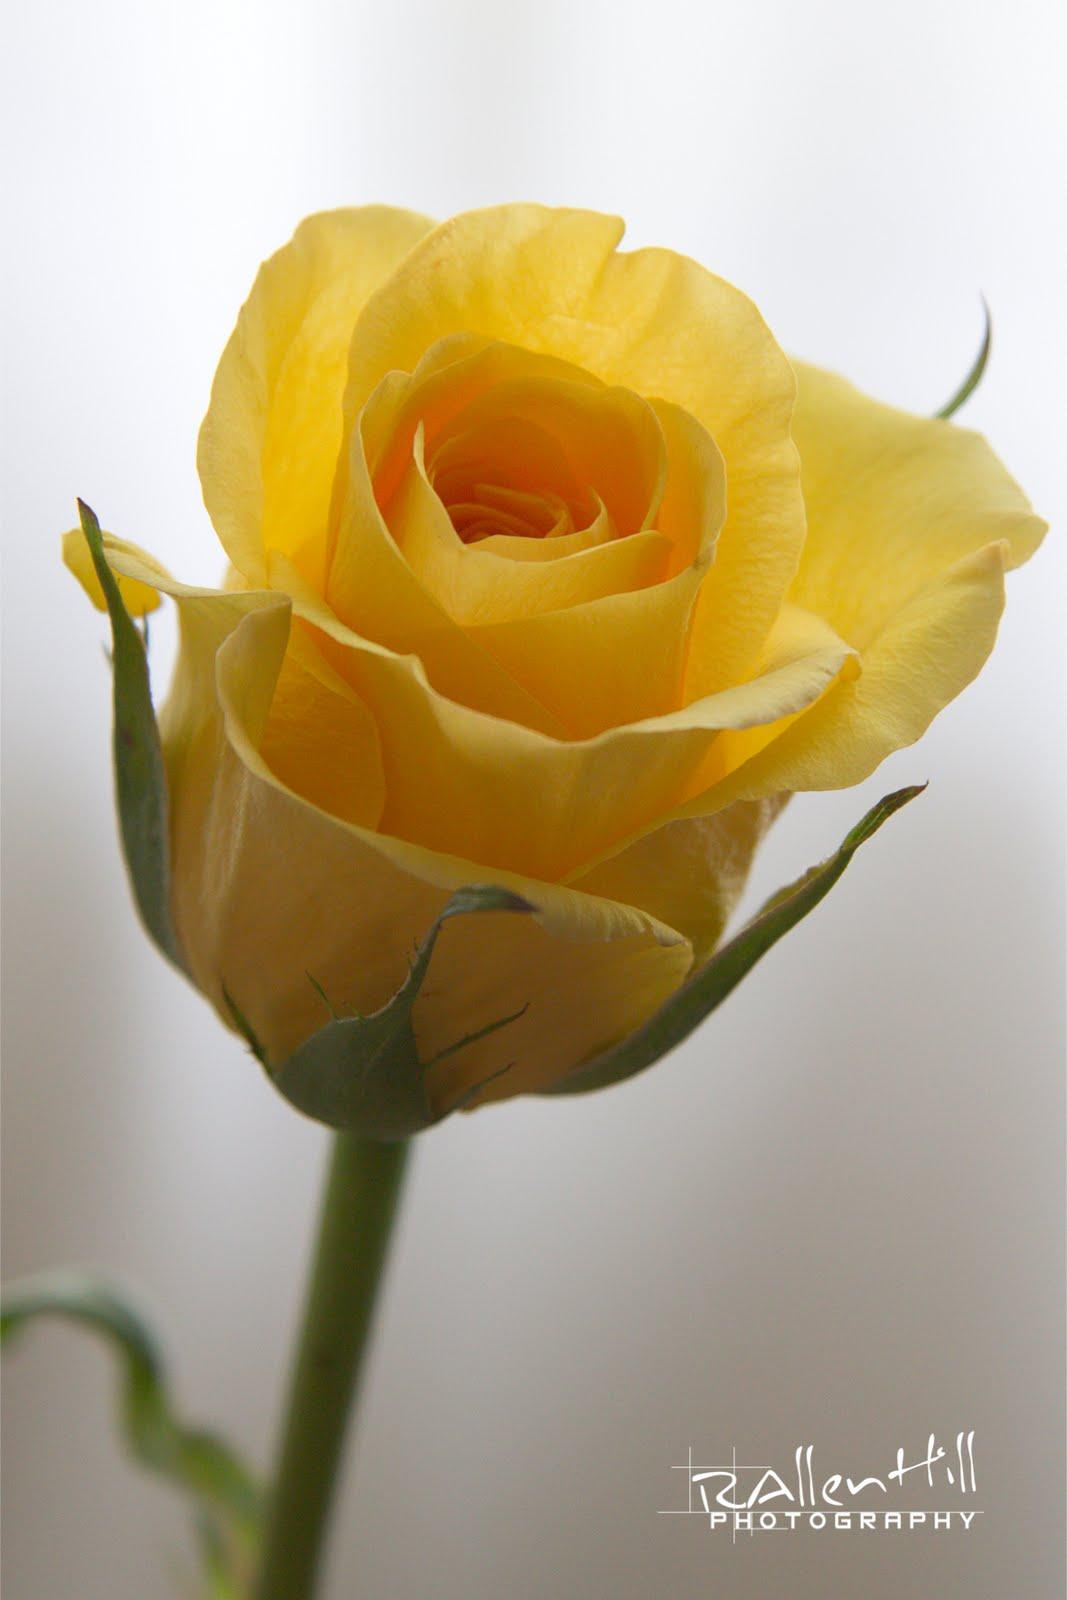 Yellow rose images hd - Yellow rose images hd ...